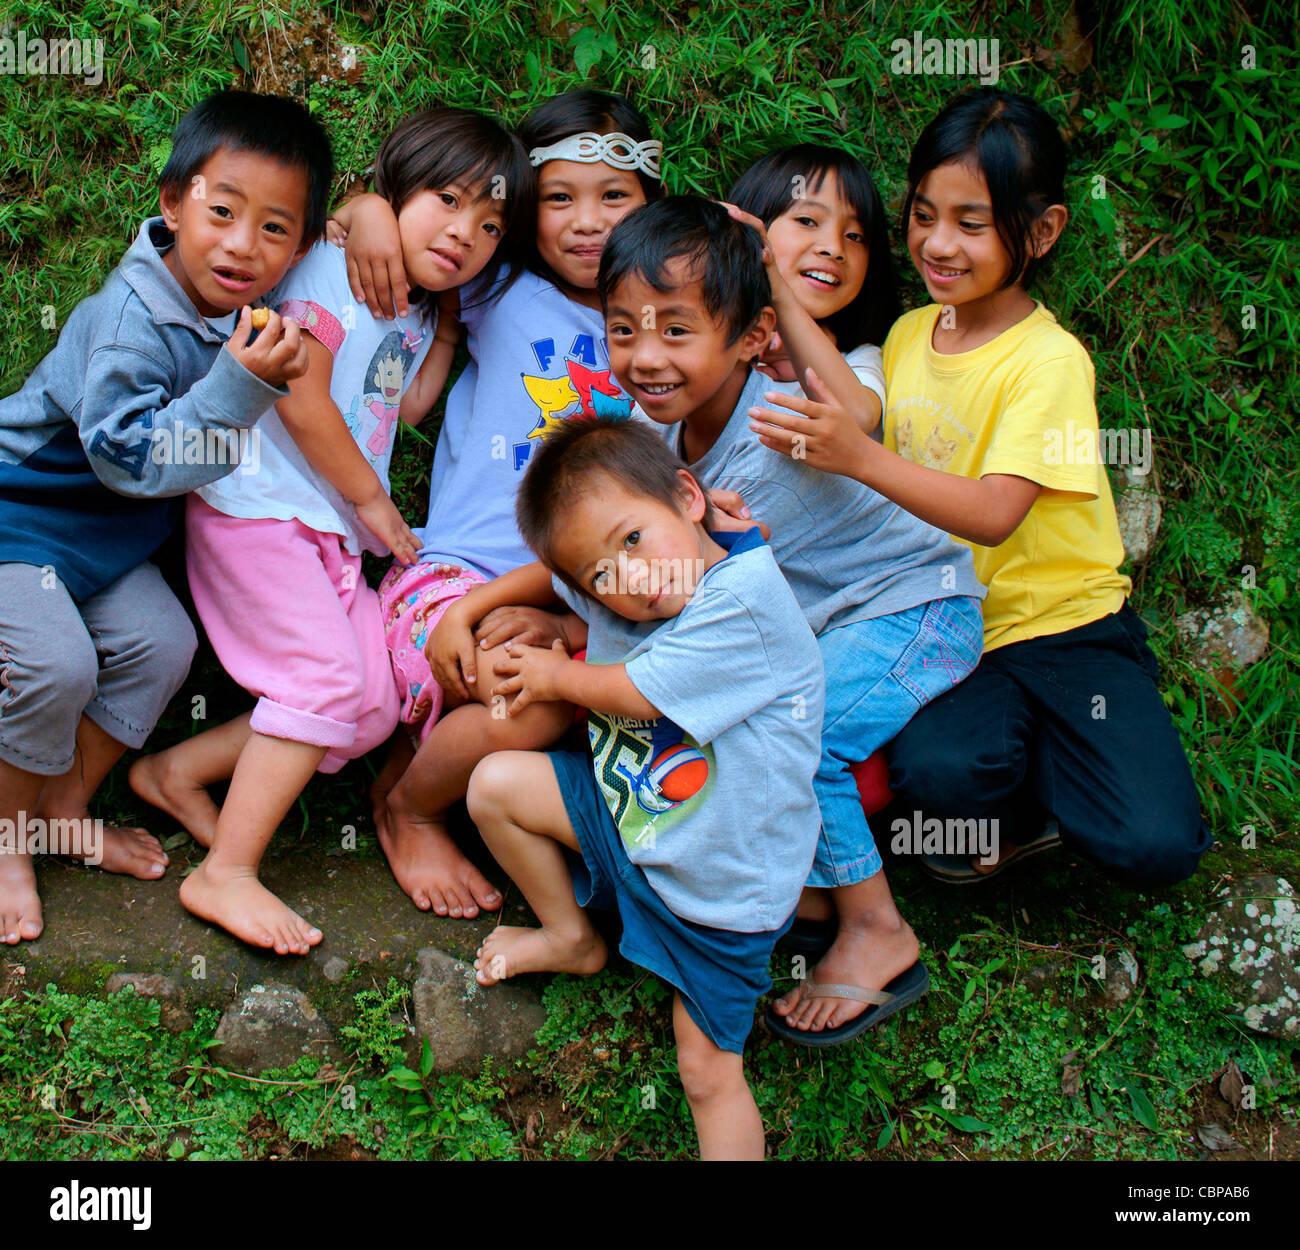 filipino kids - photo #38